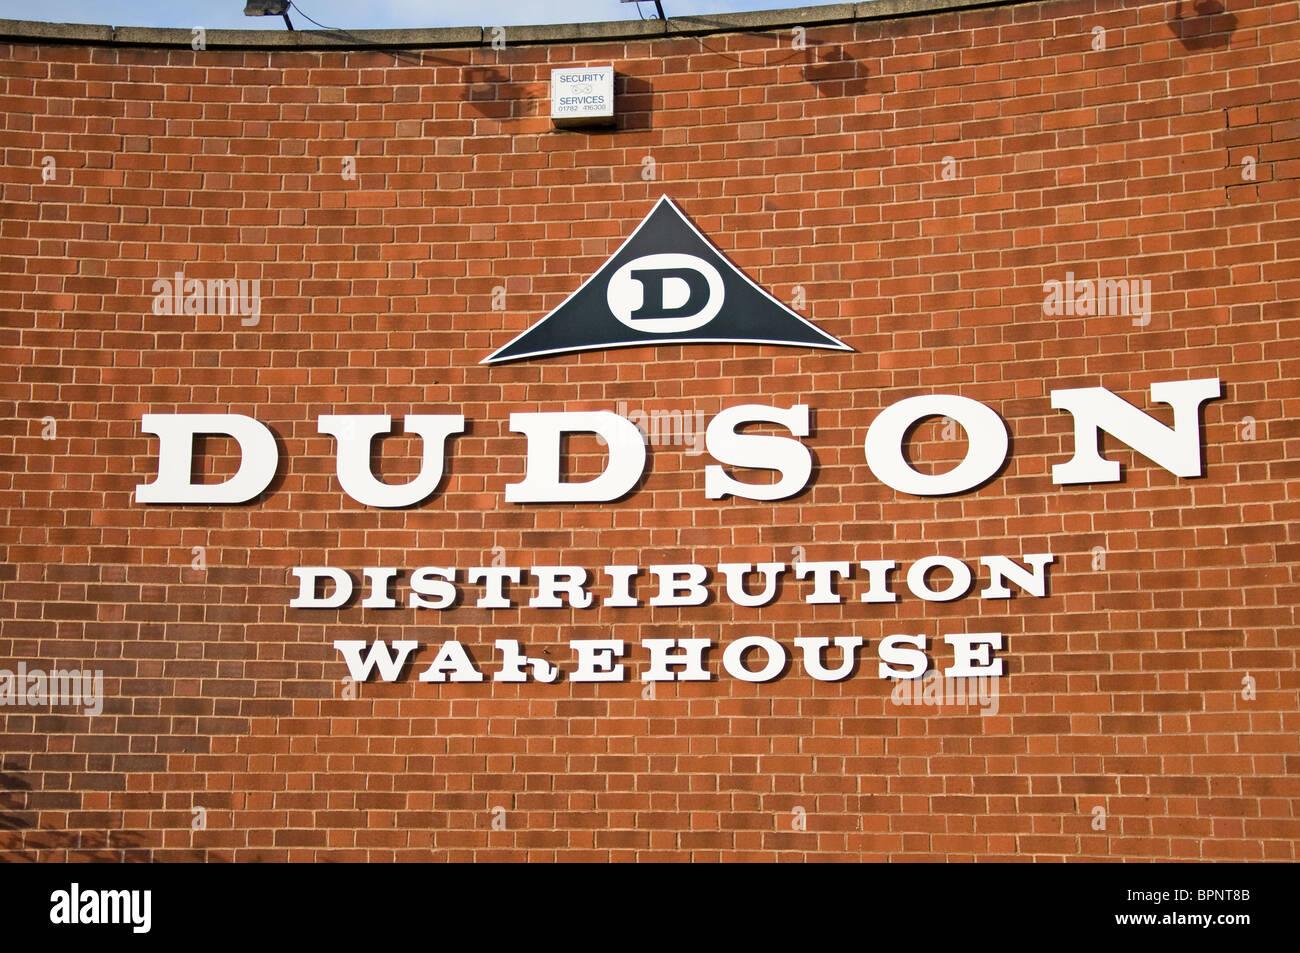 Dudson distribution warehouse sign on wall Burslem, Stoke-on-Trent, Staffordshire, UK - Stock Image